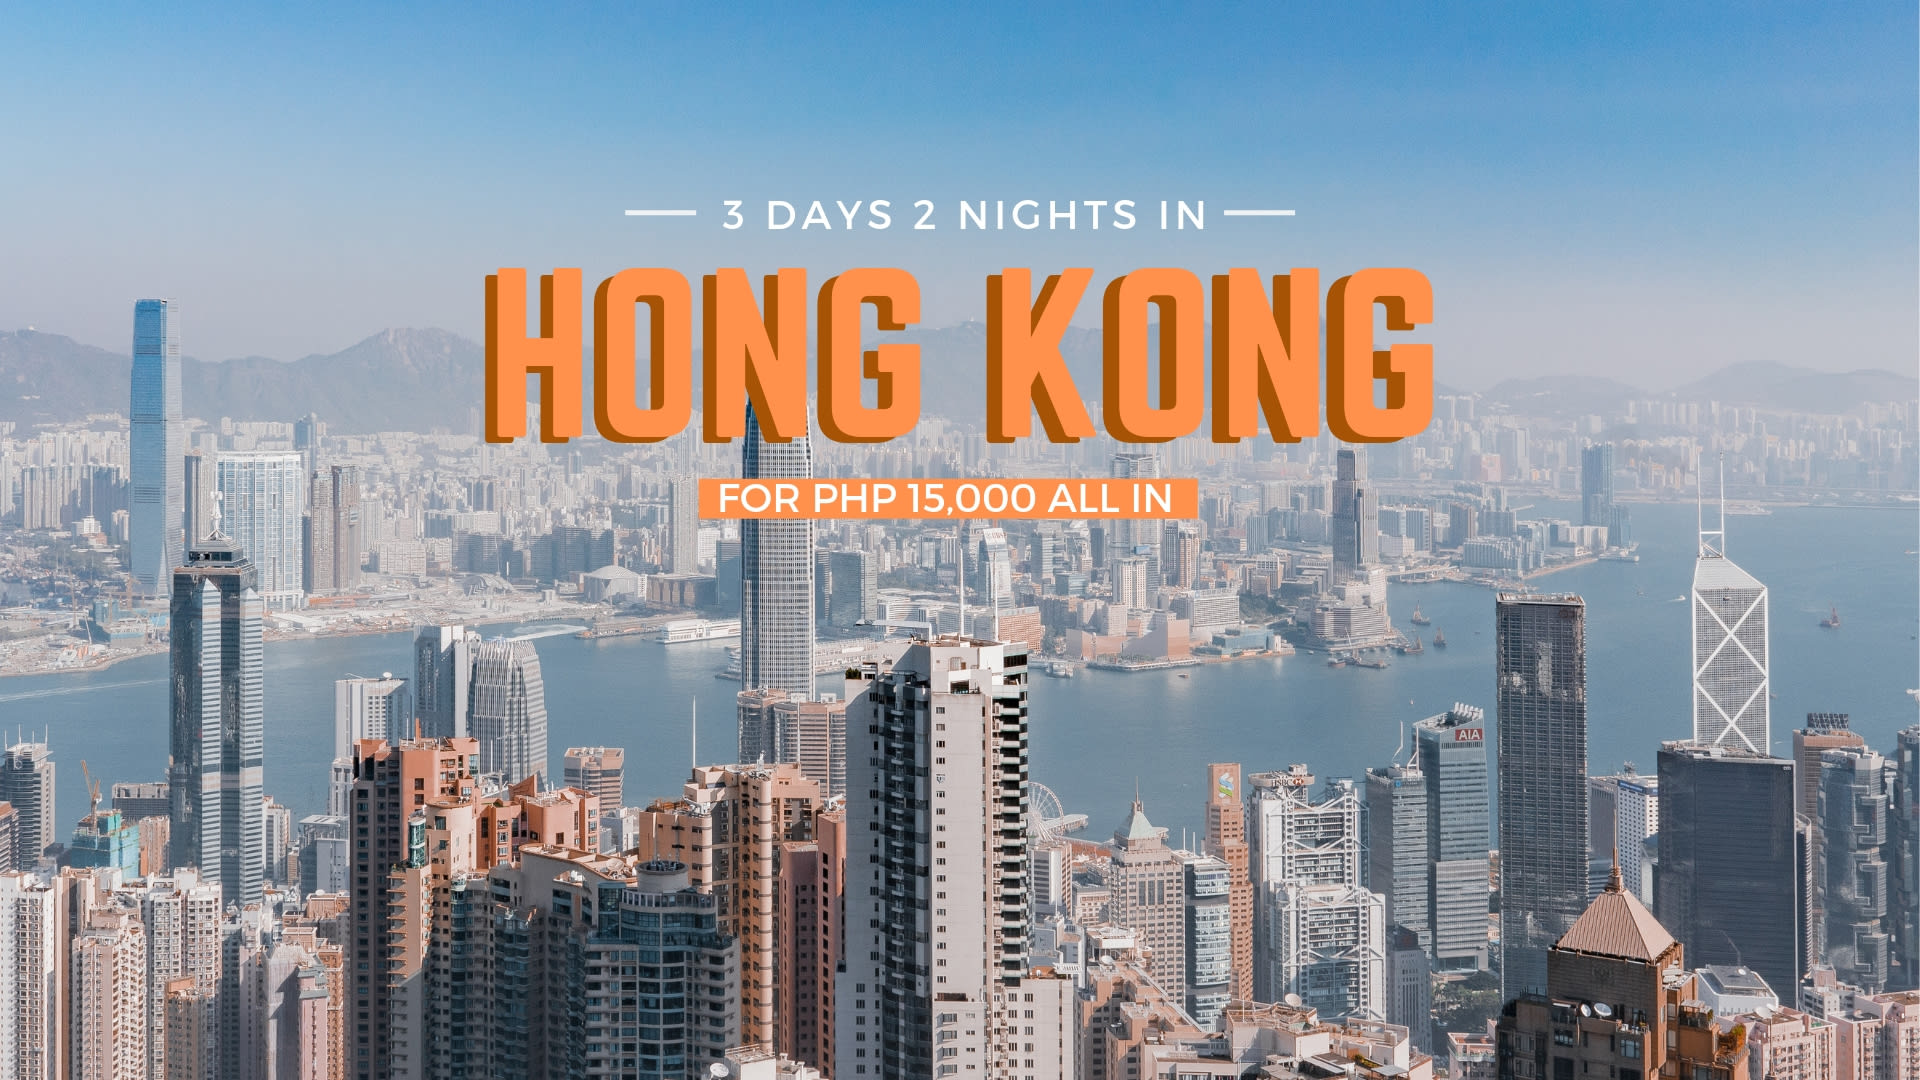 HK guide